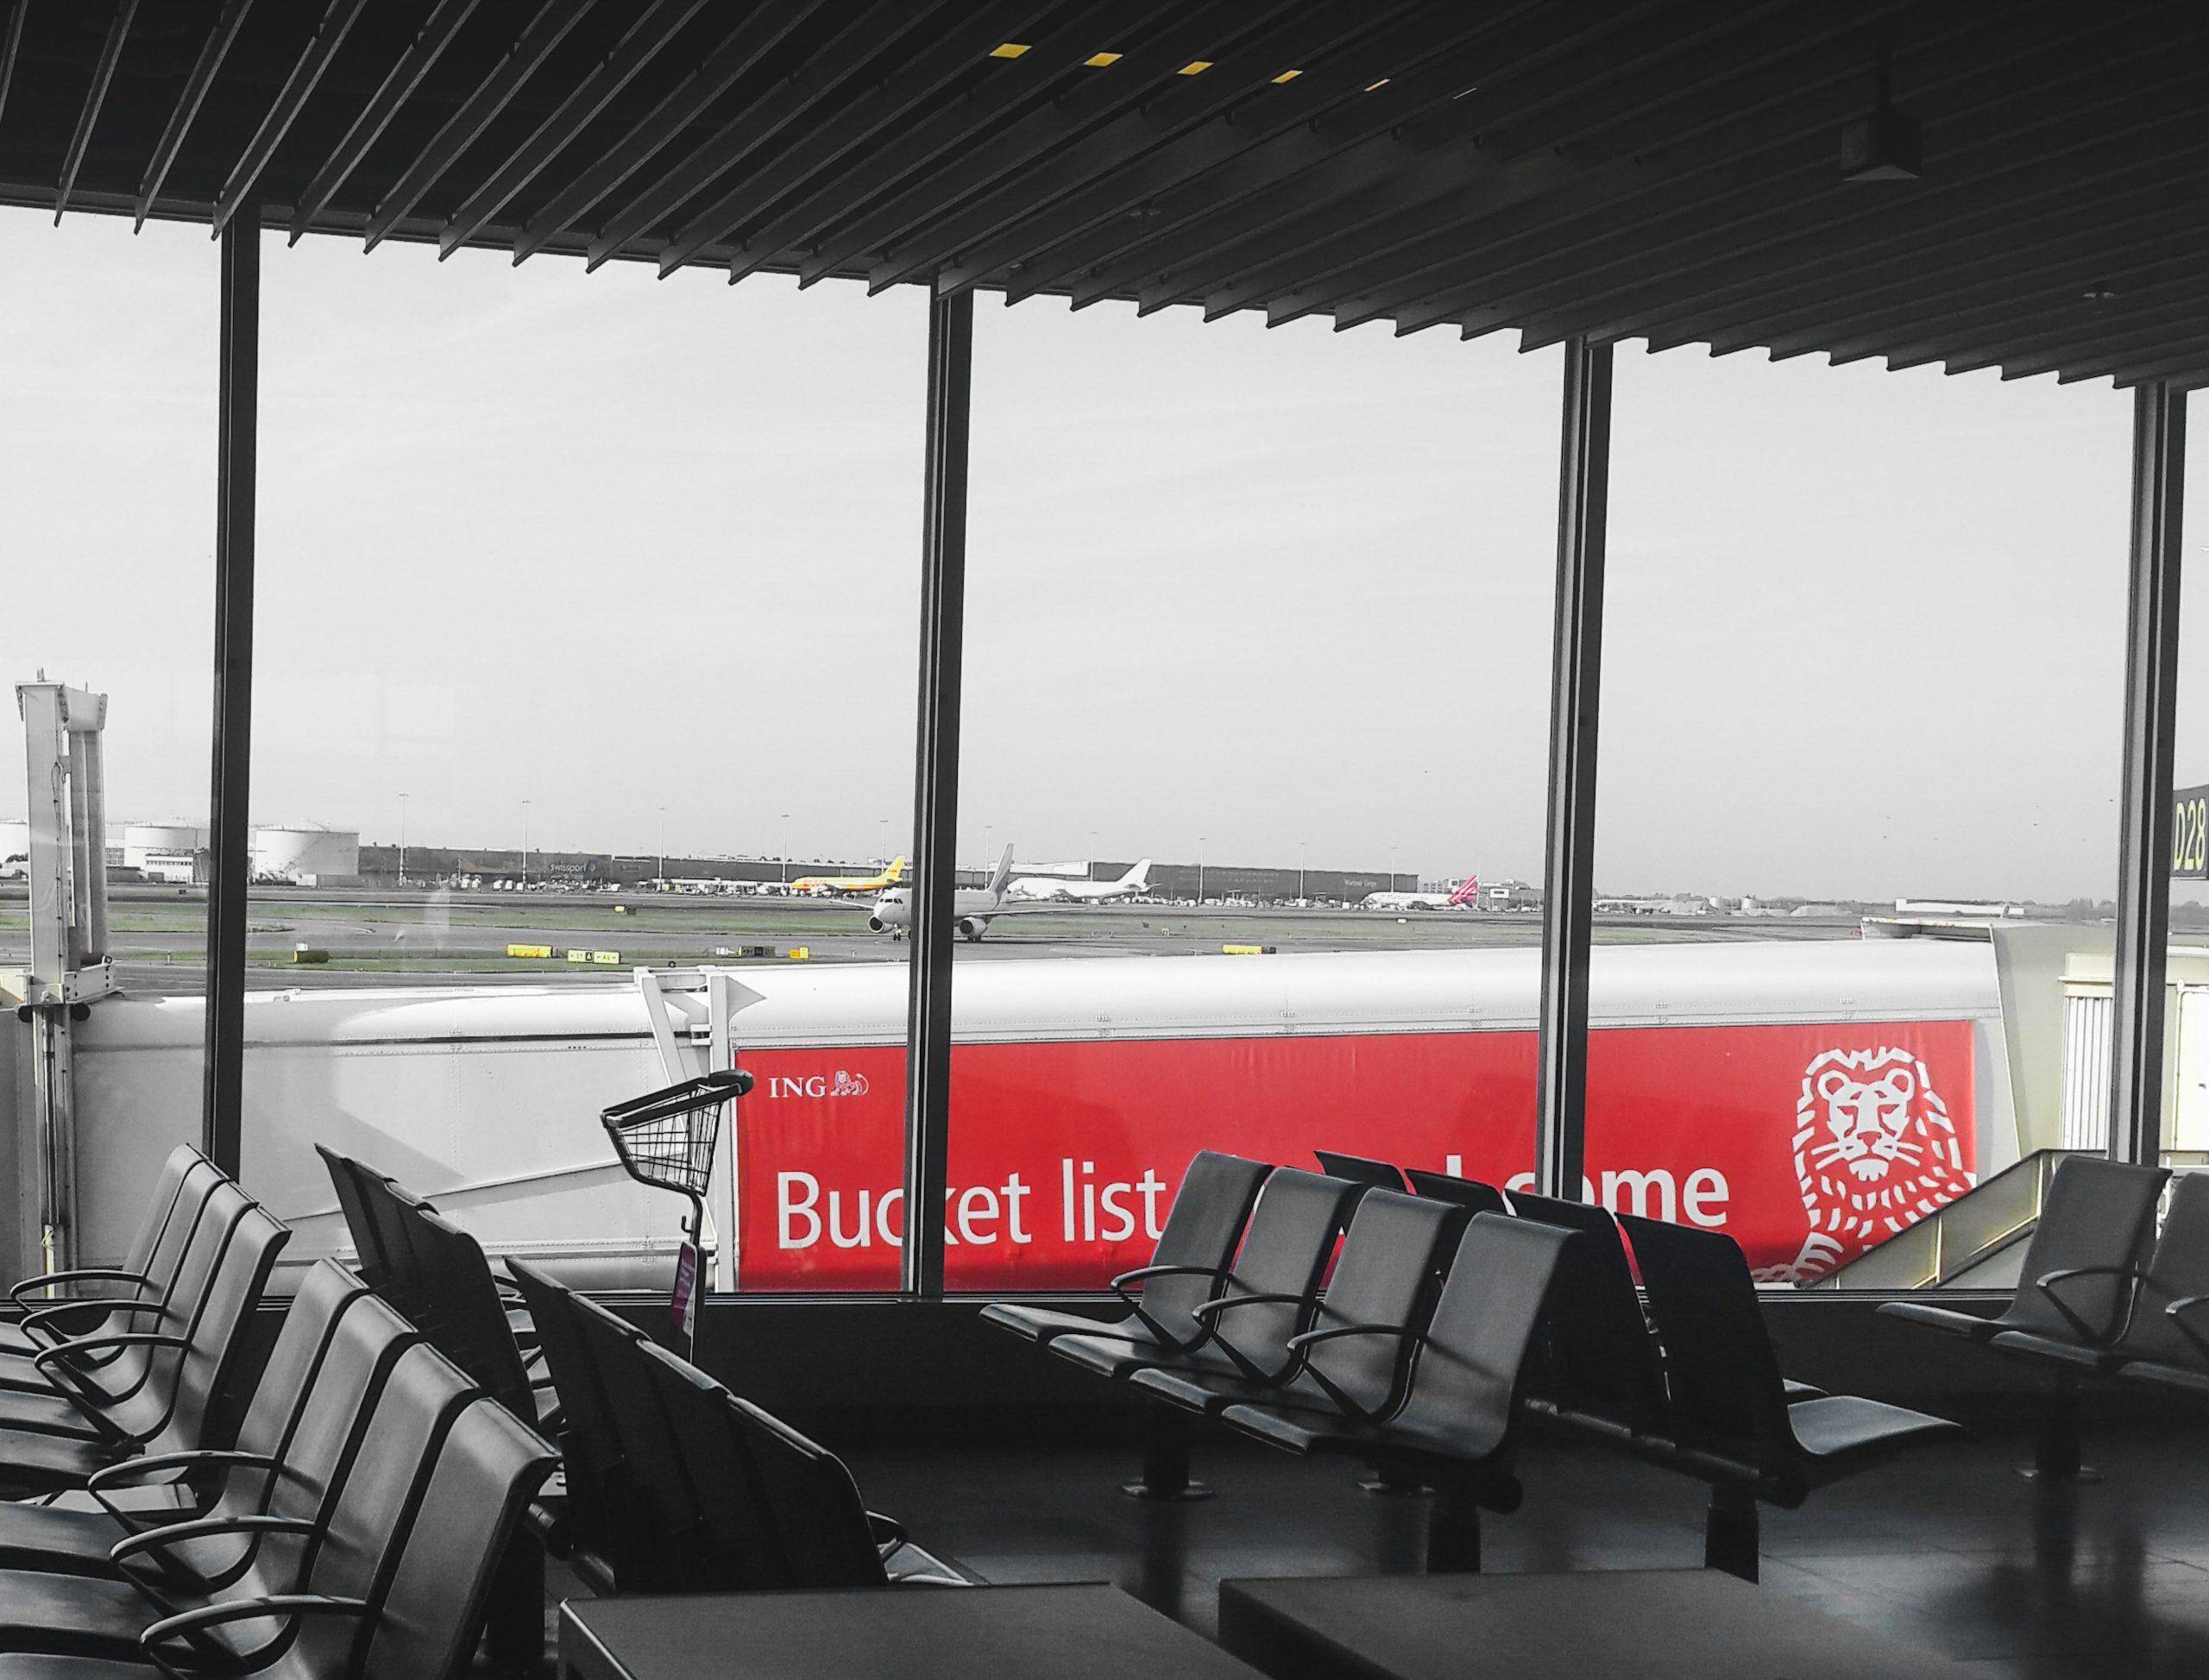 Les 4 mesures de restrictions de voyage du Canada (et quand elles prendront fin)